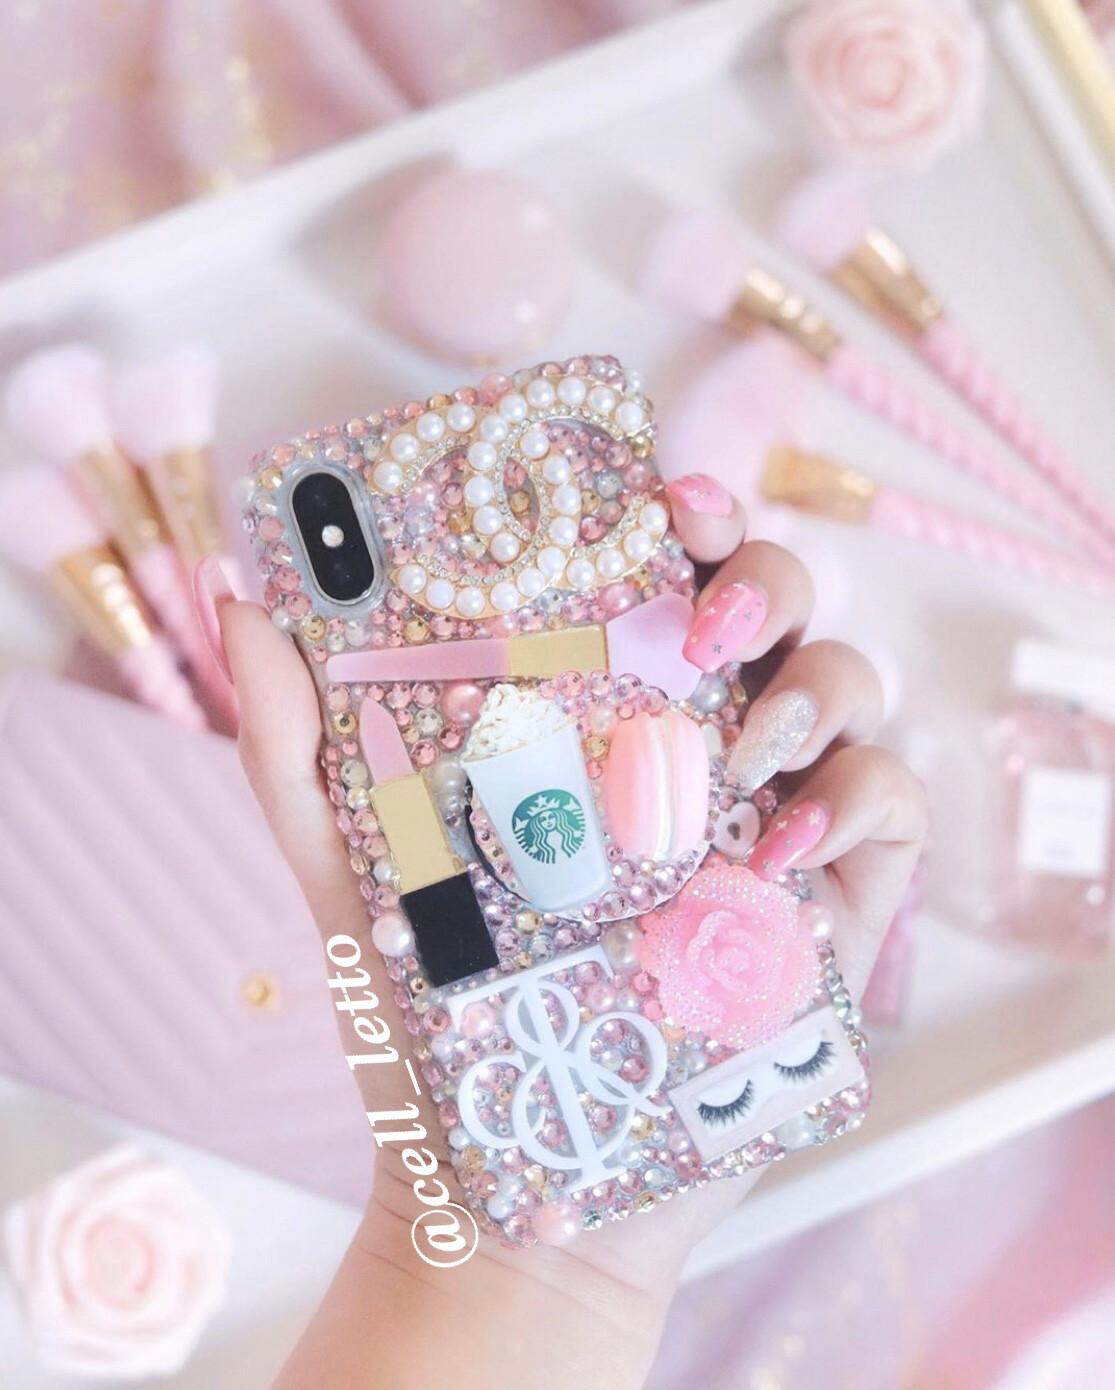 Sweet & Girly Design Phone Case